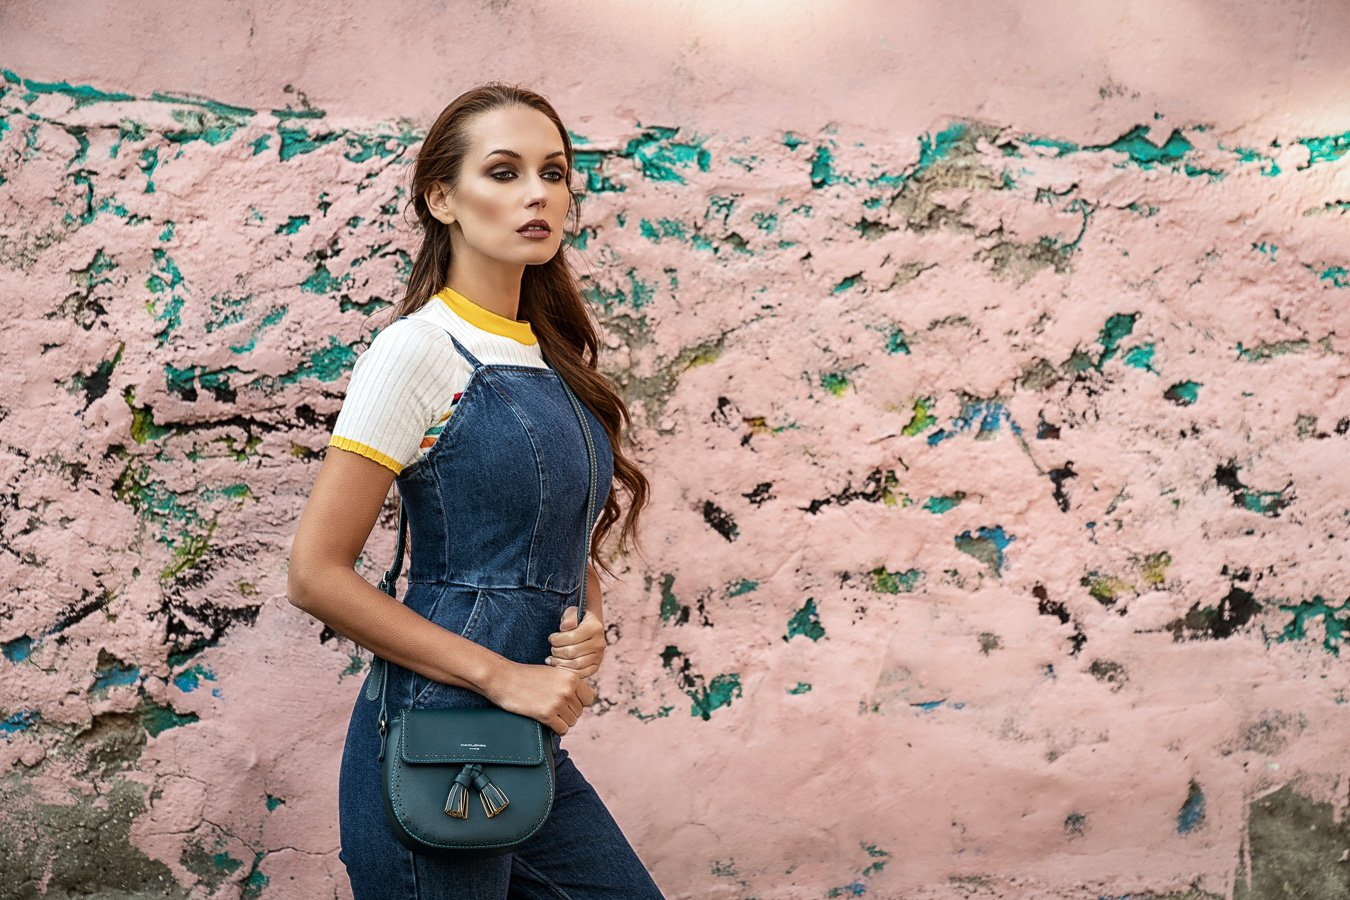 Moda Çekimi - Editorial - Beauty moda tekstil burakbulutfotografatolyesi 24